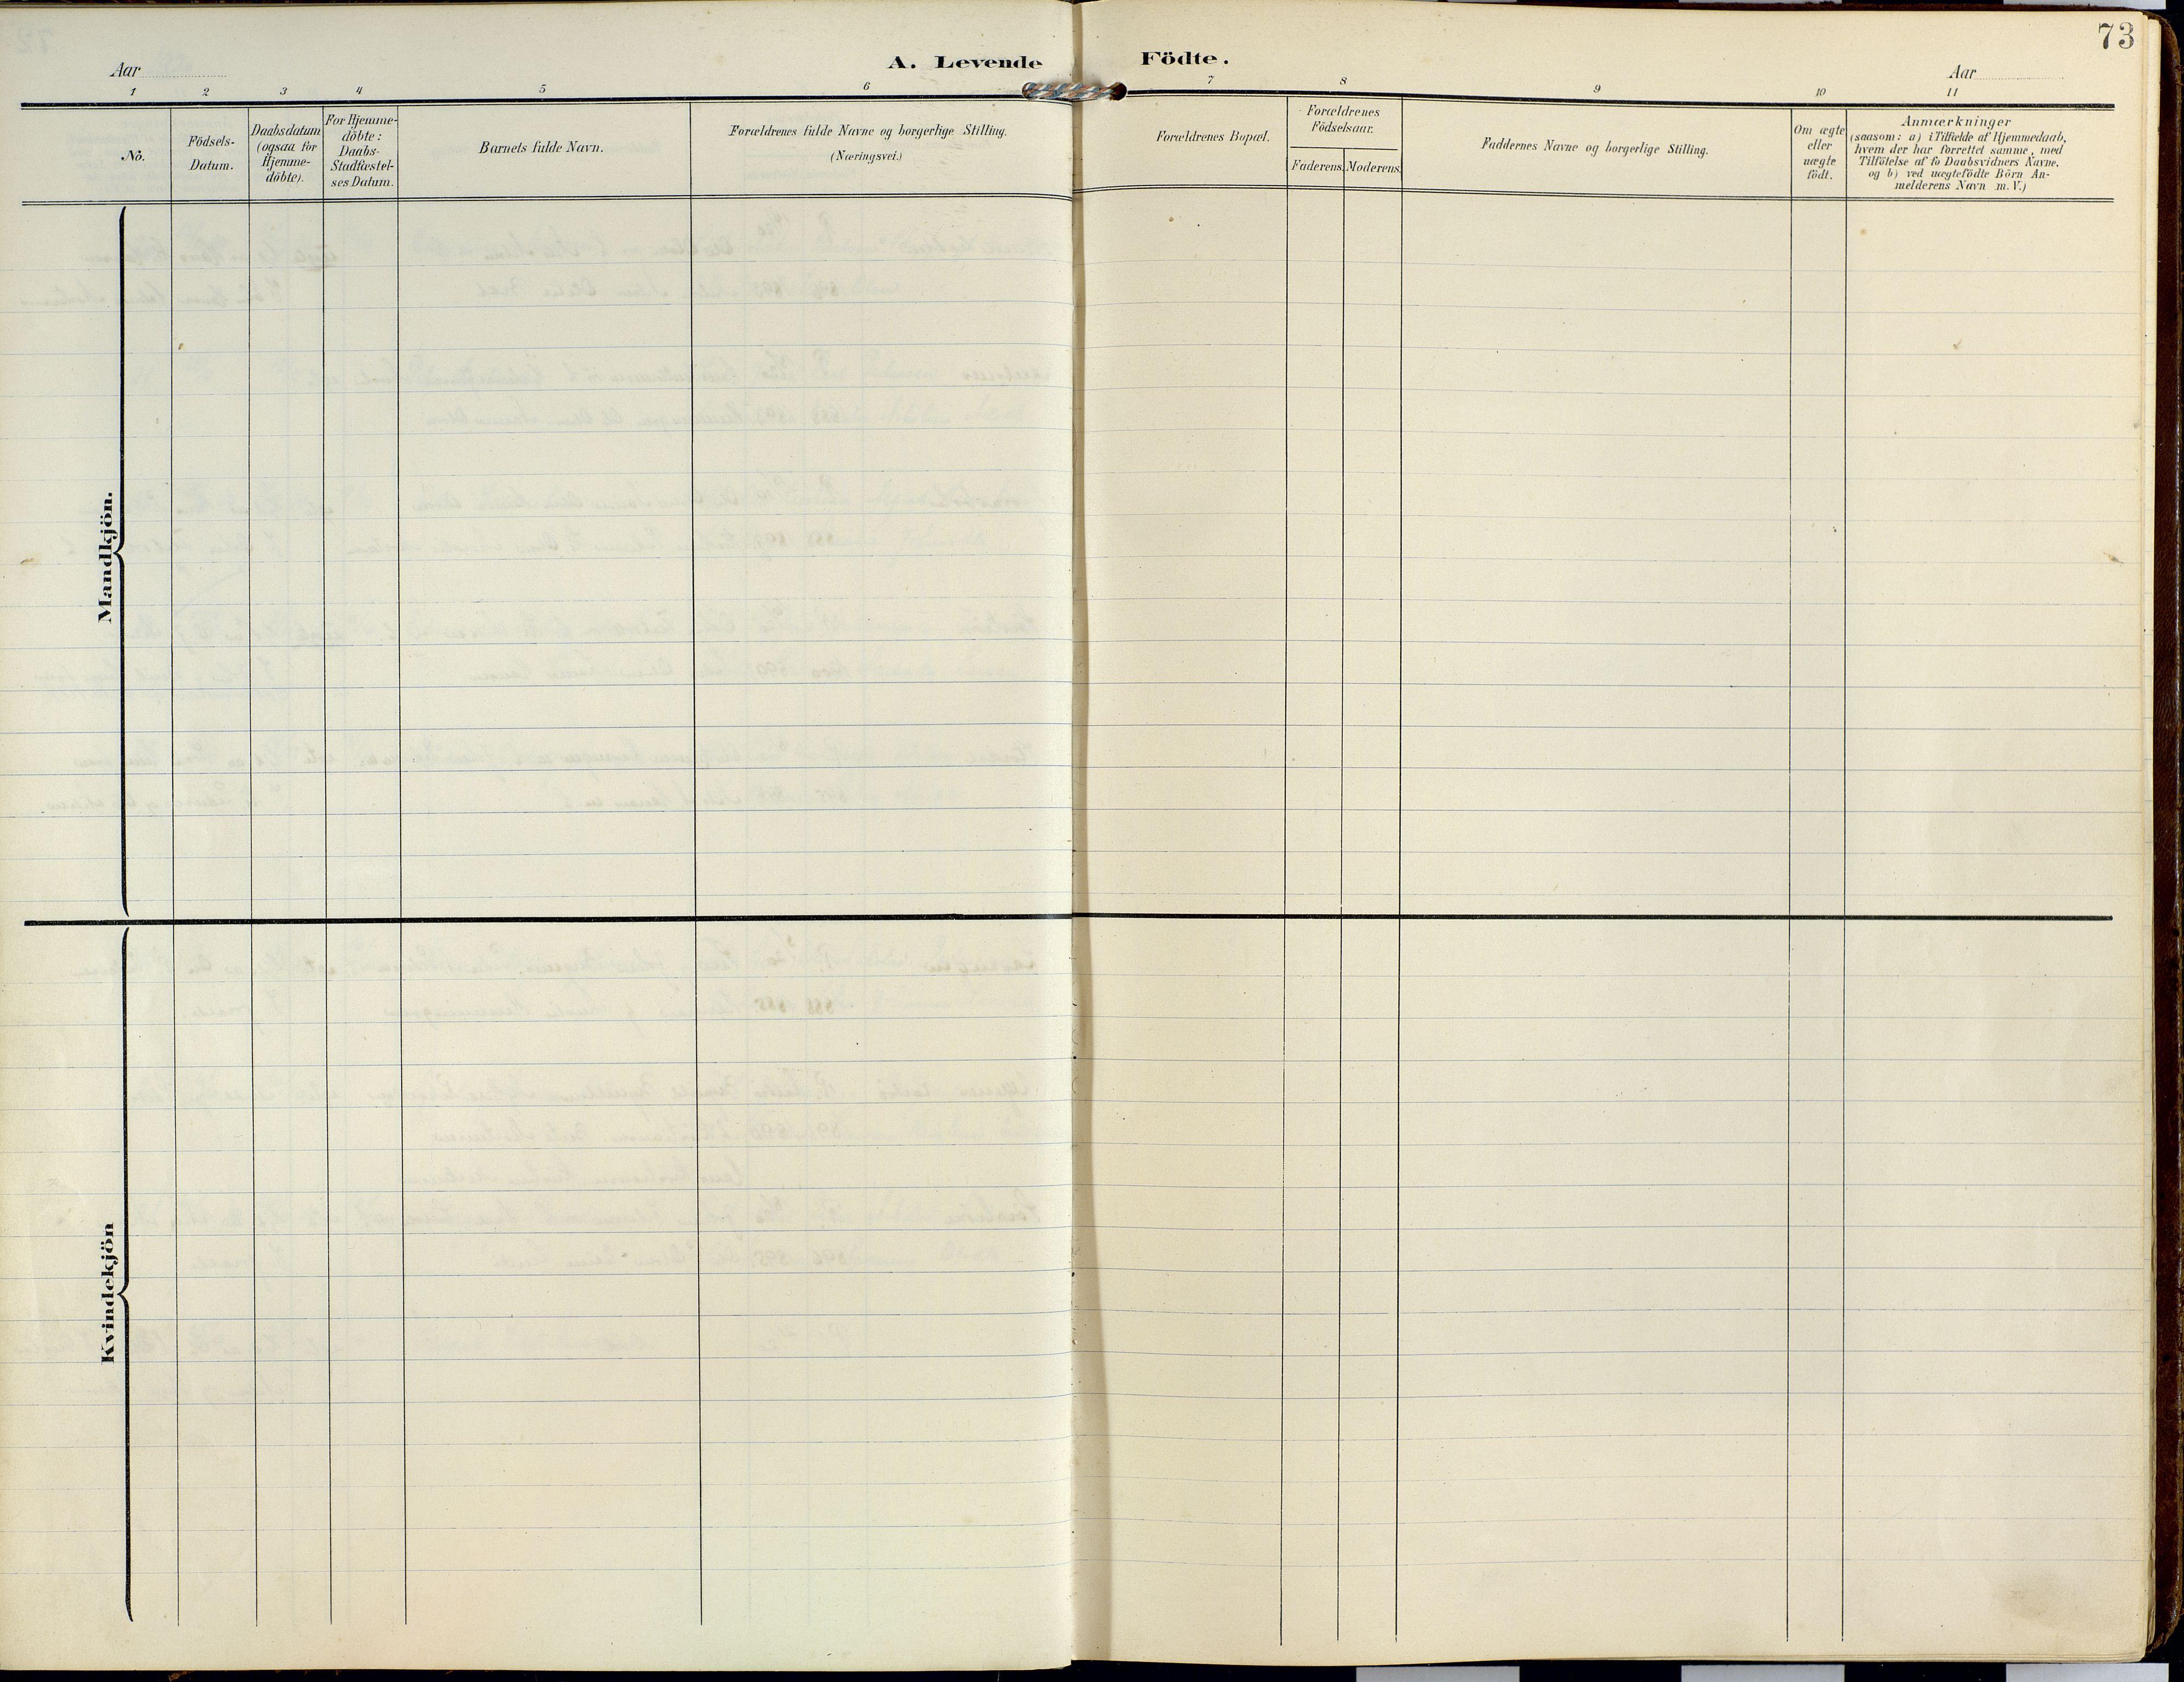 SATØ, Lyngen sokneprestembete, Ministerialbok nr. 14, 1905-1920, s. 73